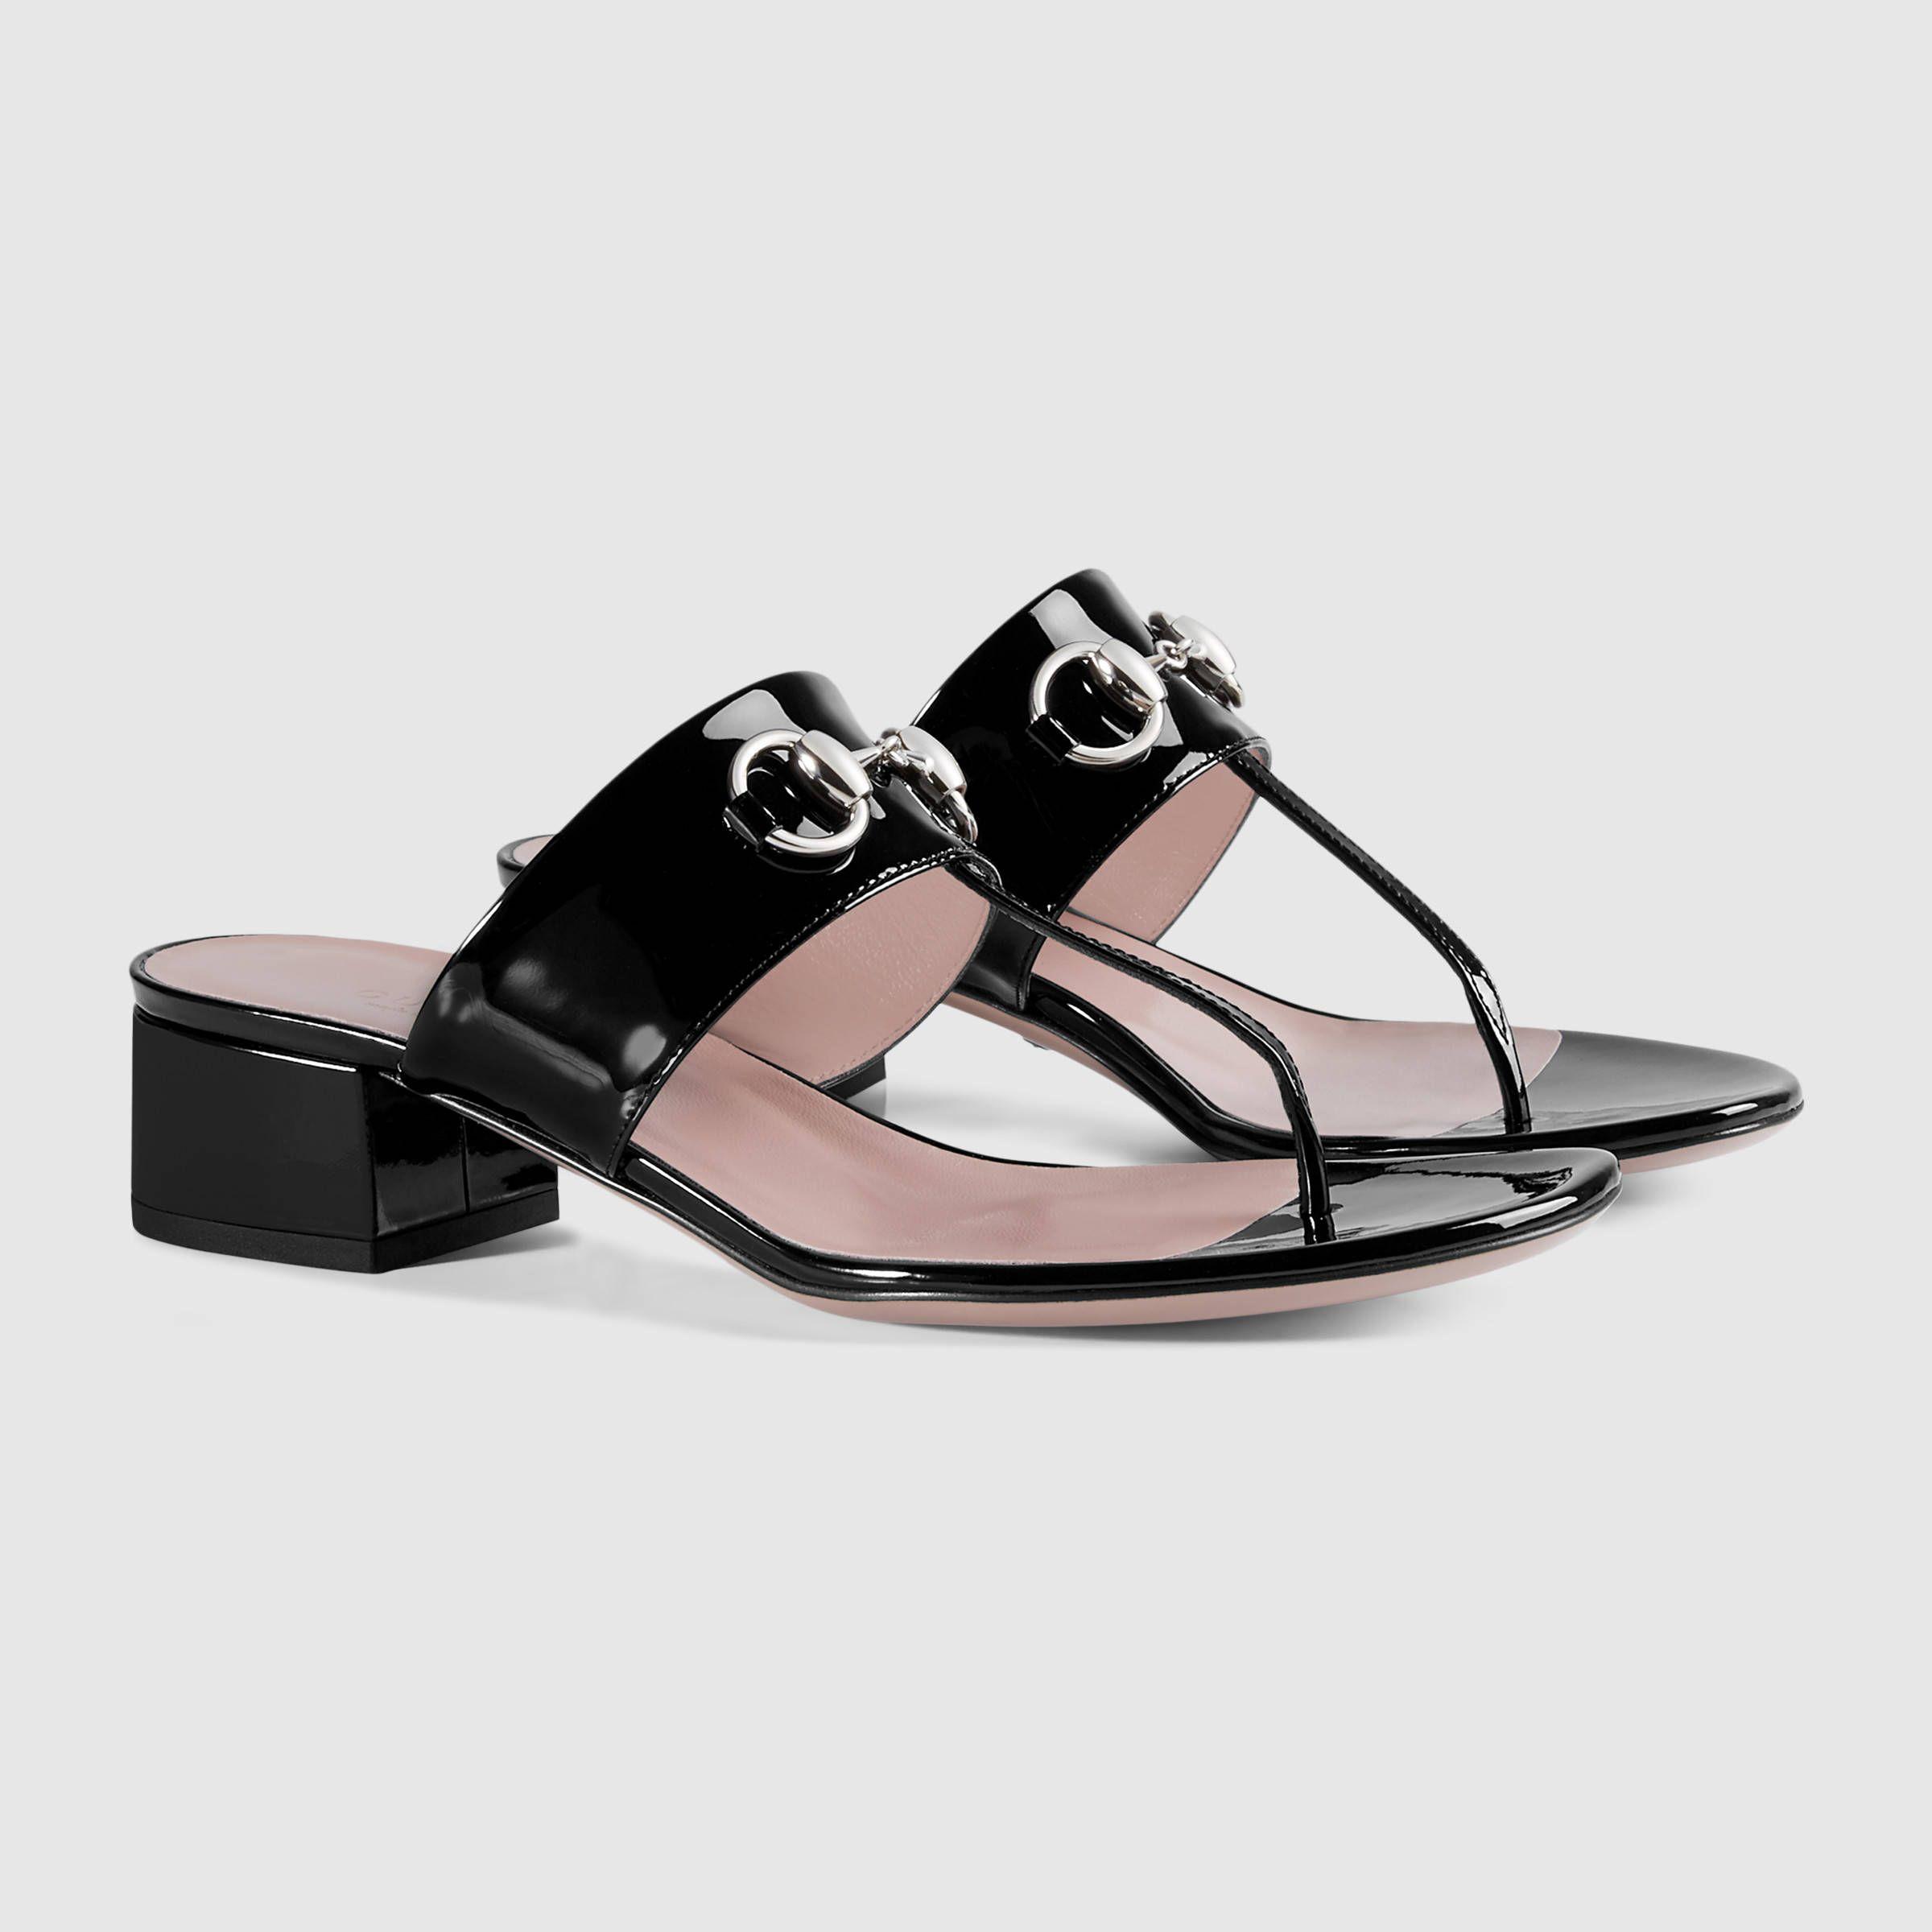 Gucci Women - Patent leather horsebit sandal - 370460BNC001000